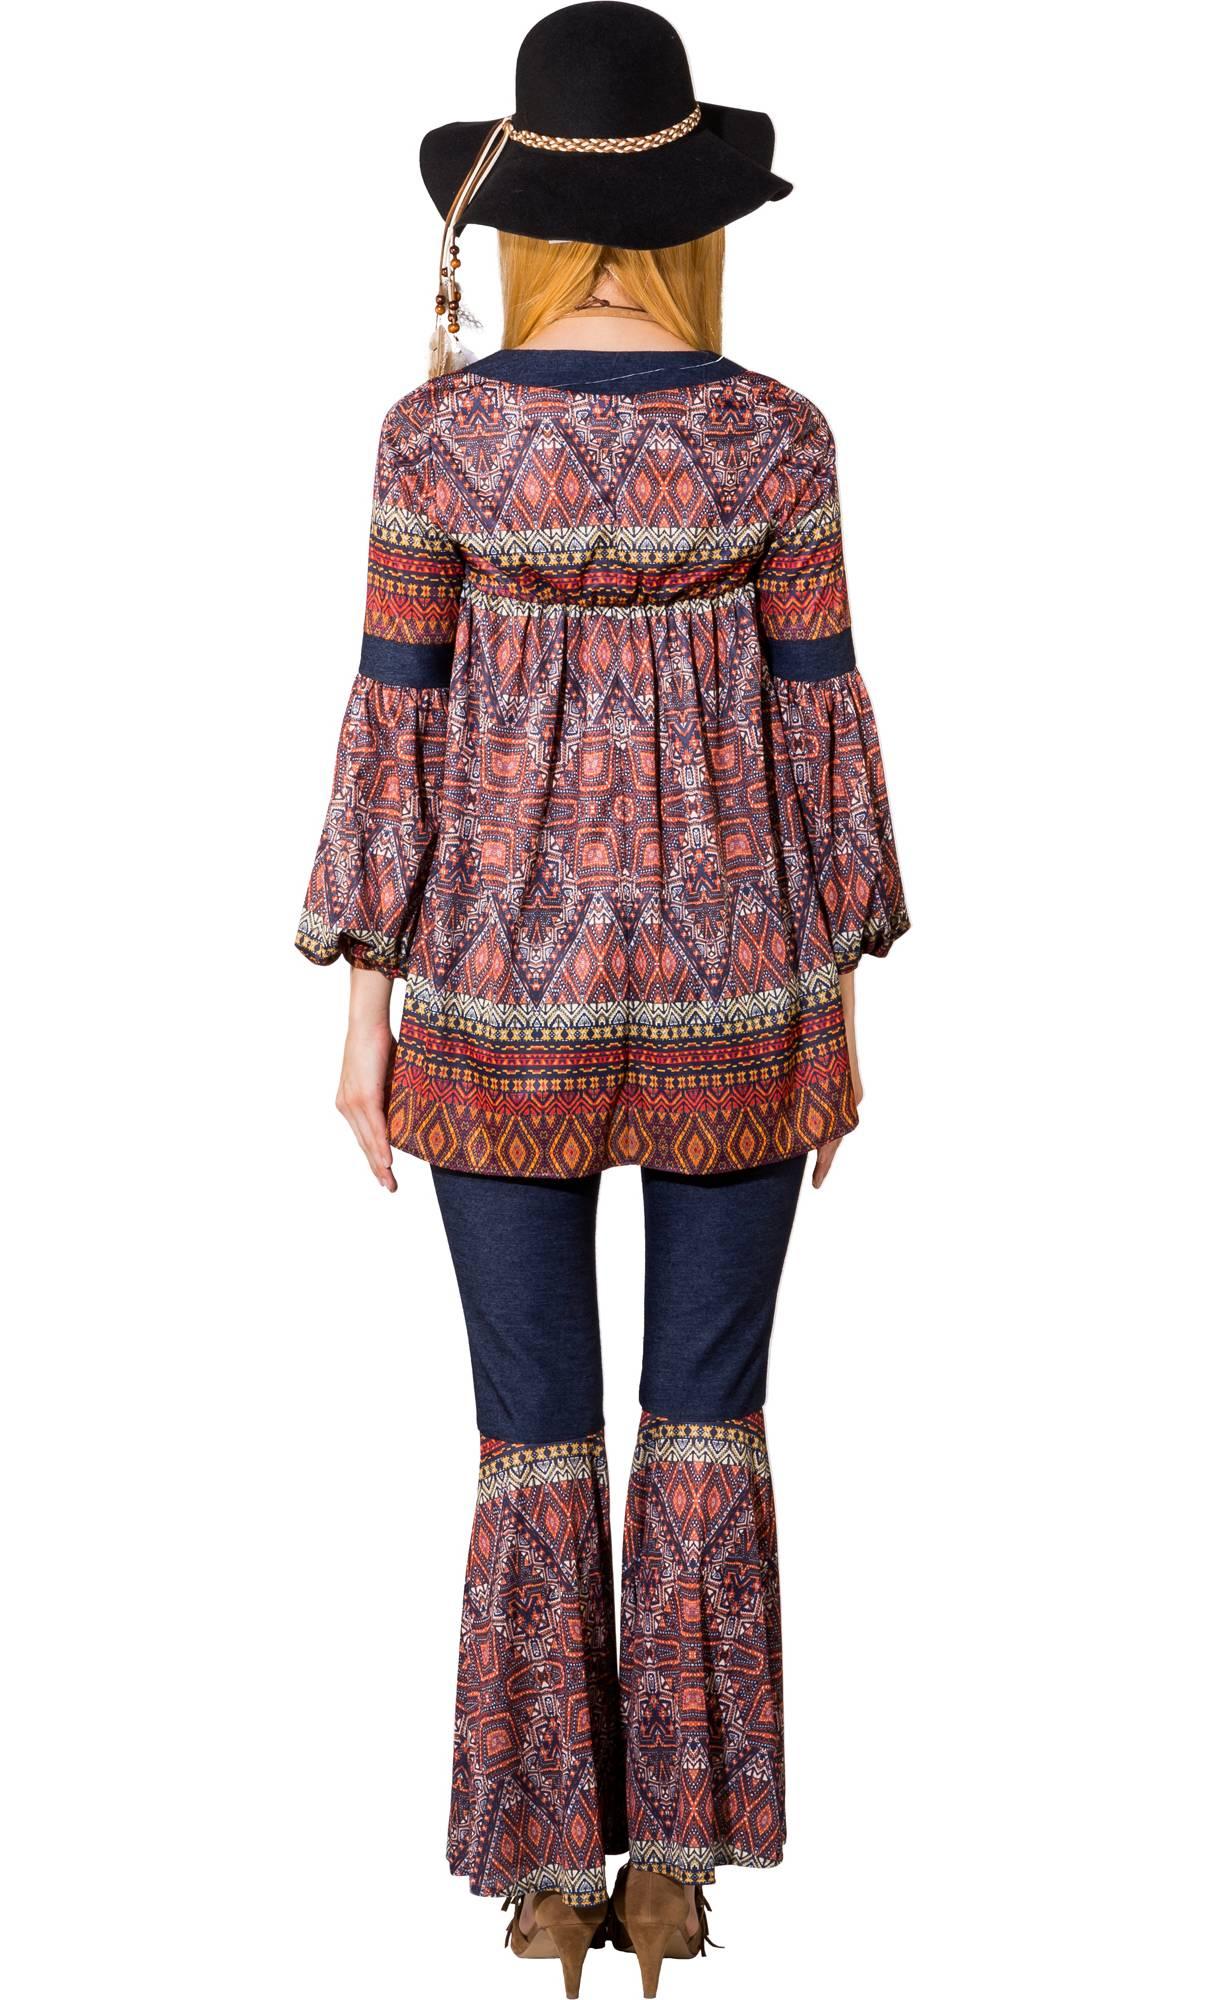 Costume-Hippie-femme-3